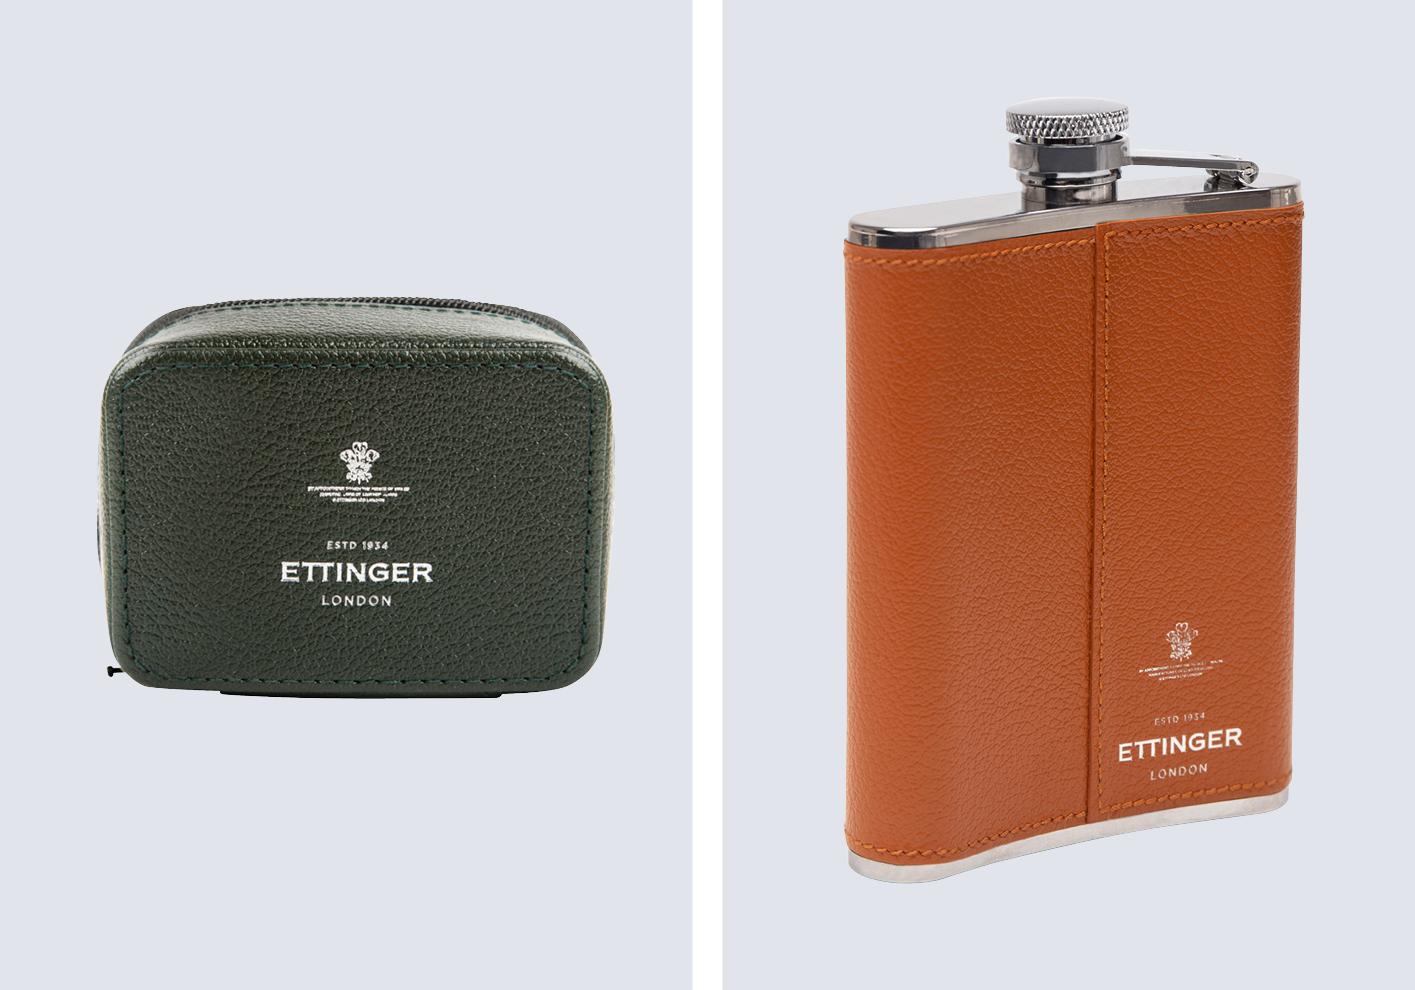 Ettinger Capra goat leather zipped case and 6oz hip flasks